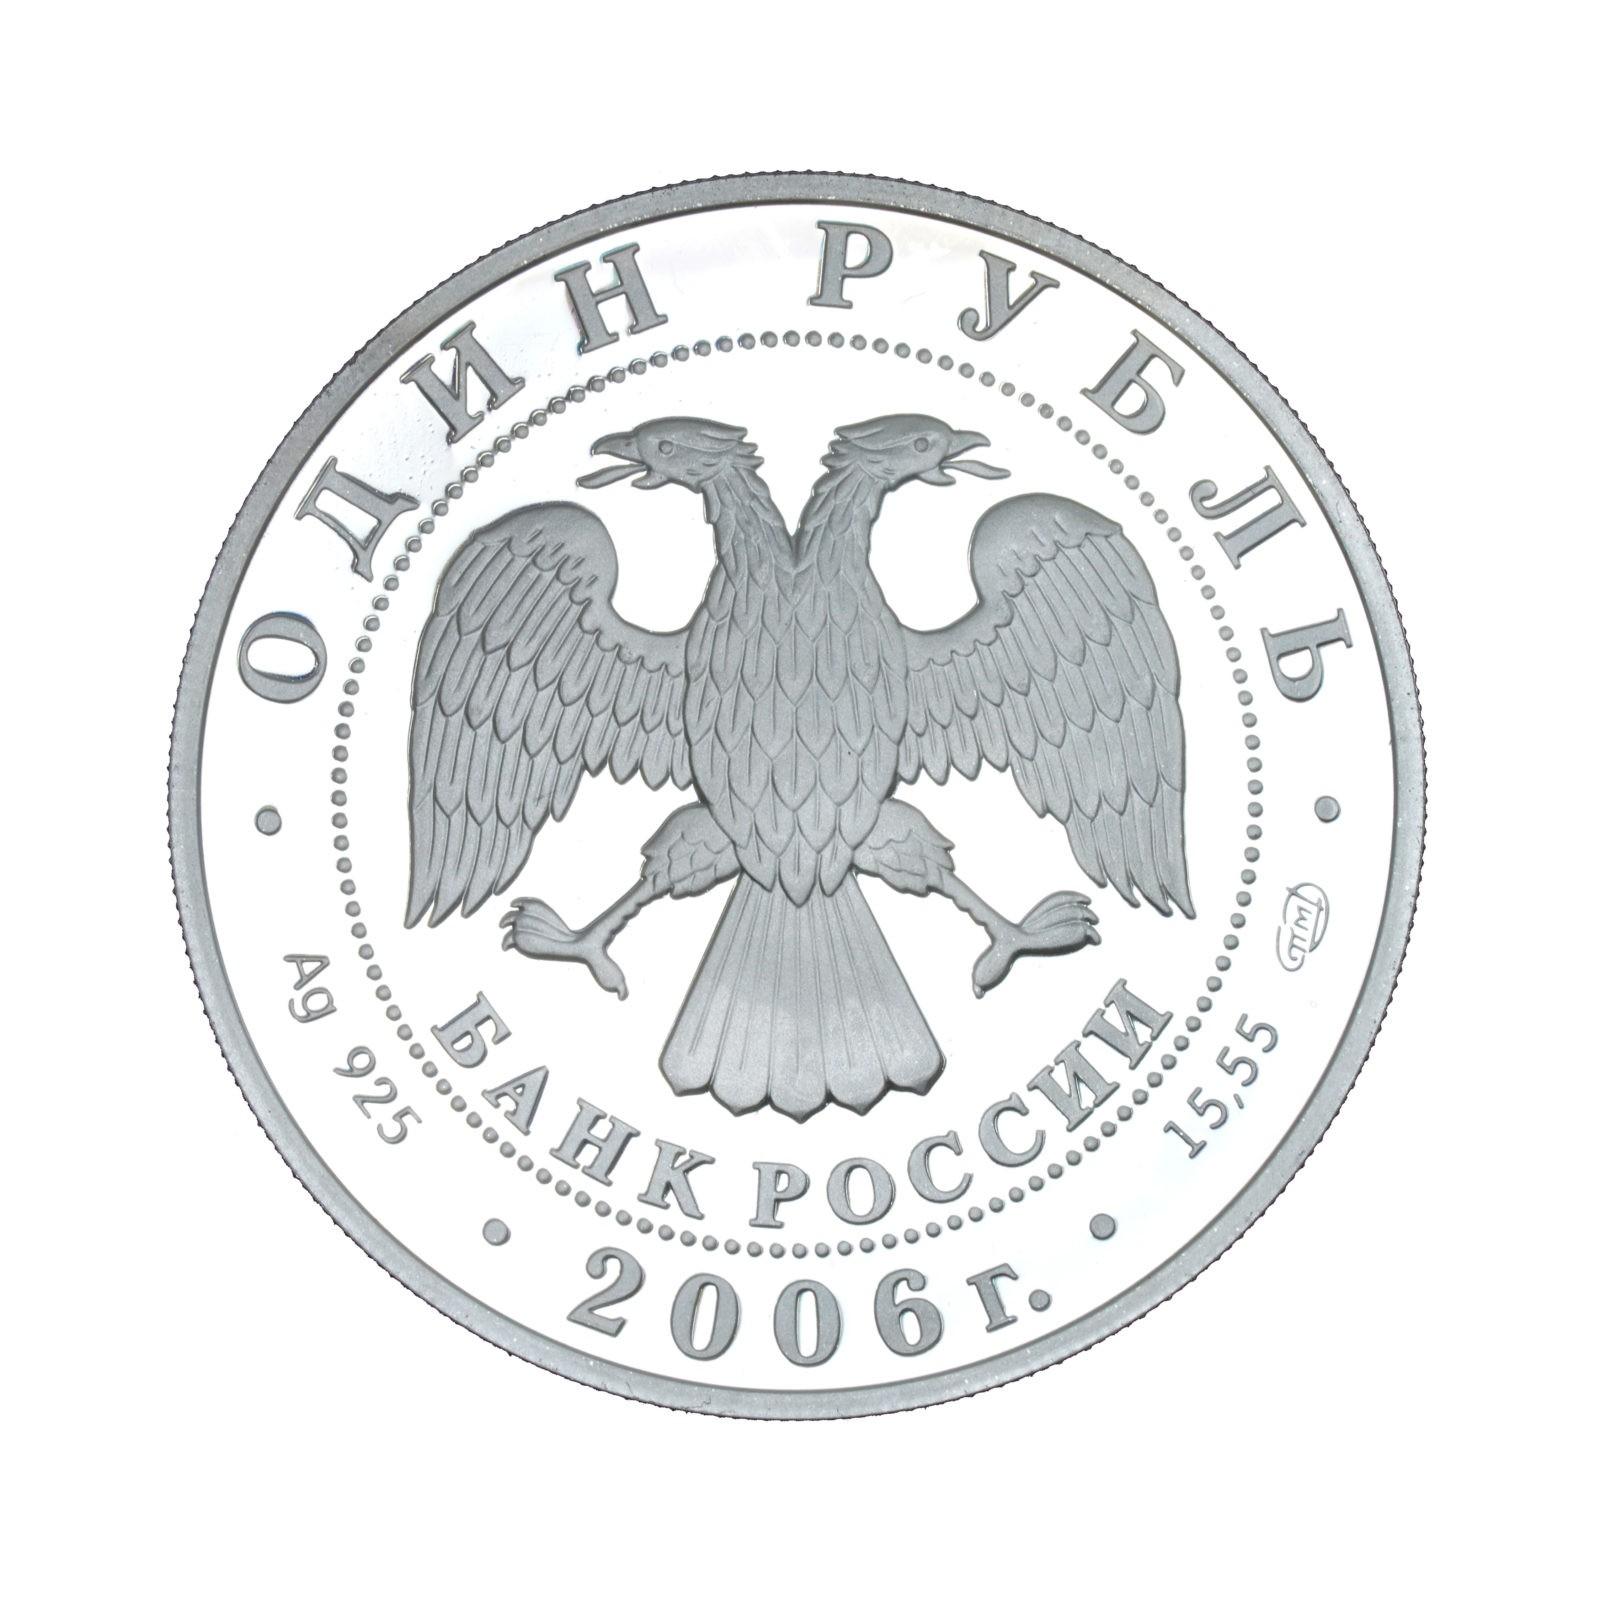 1 рубль 2006 года СПМД «уссурийский когтистый тритон»